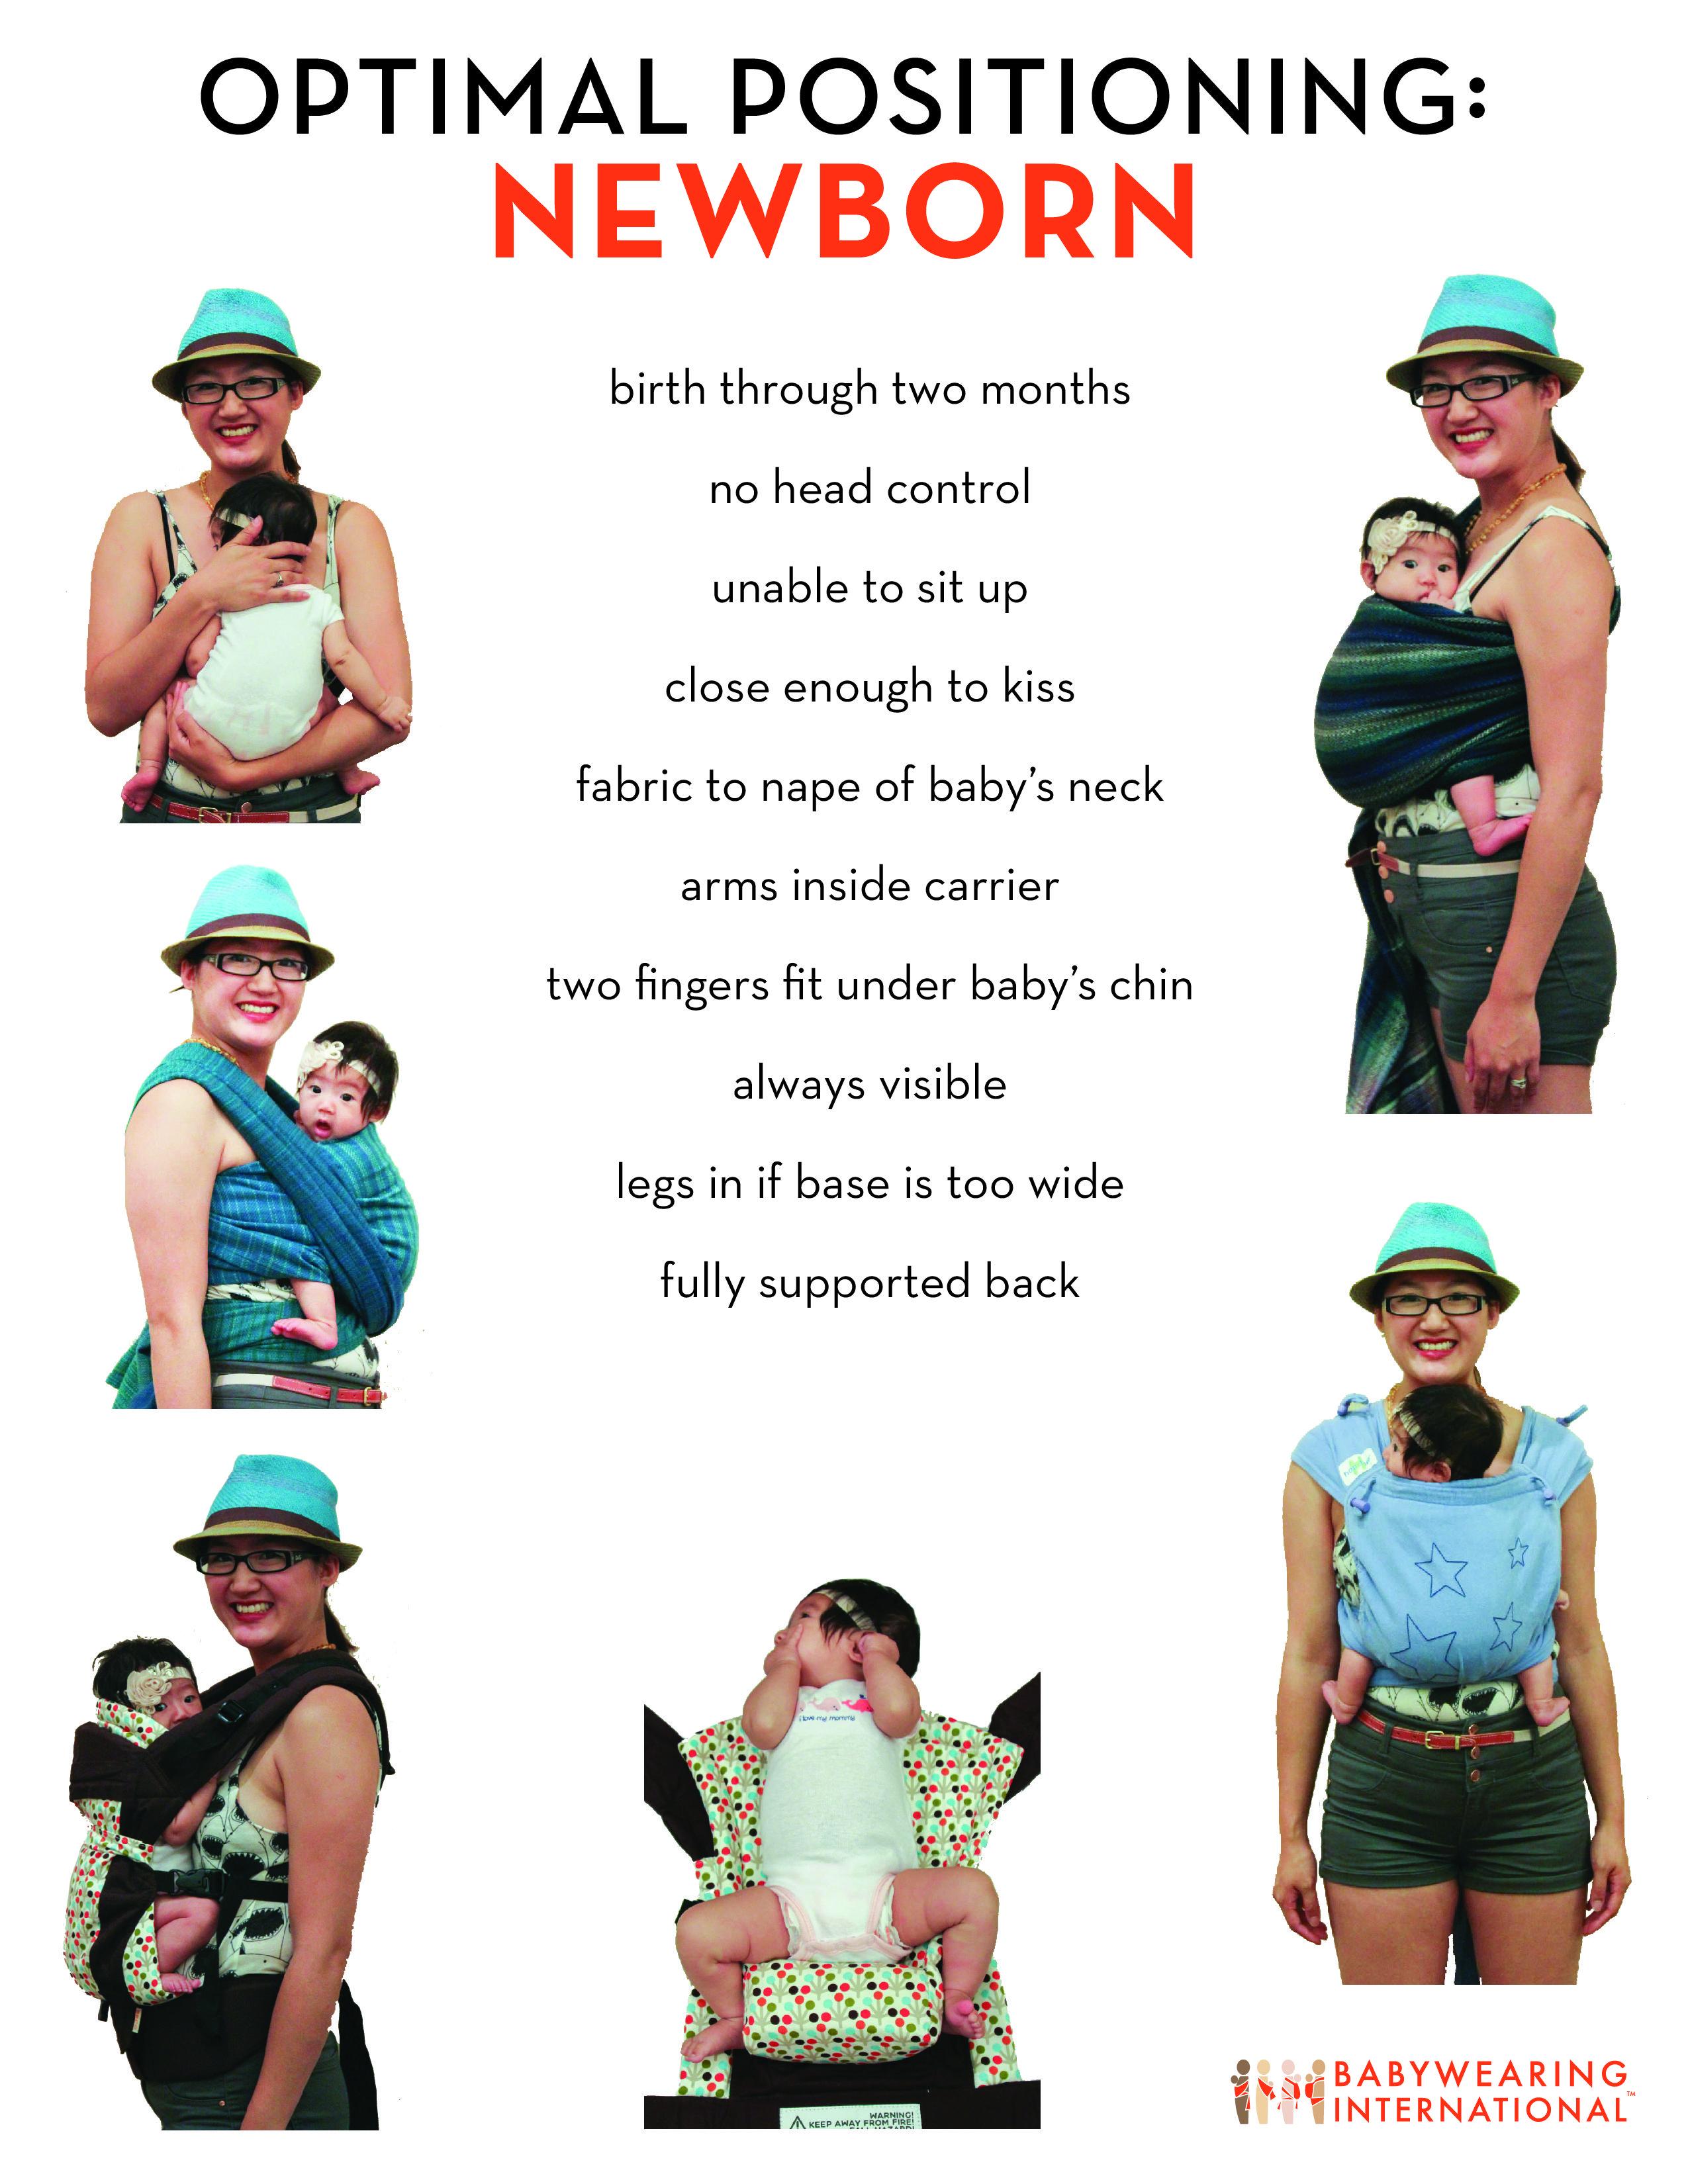 Optimal Positioning Newborn Www Babywearininginternational Org